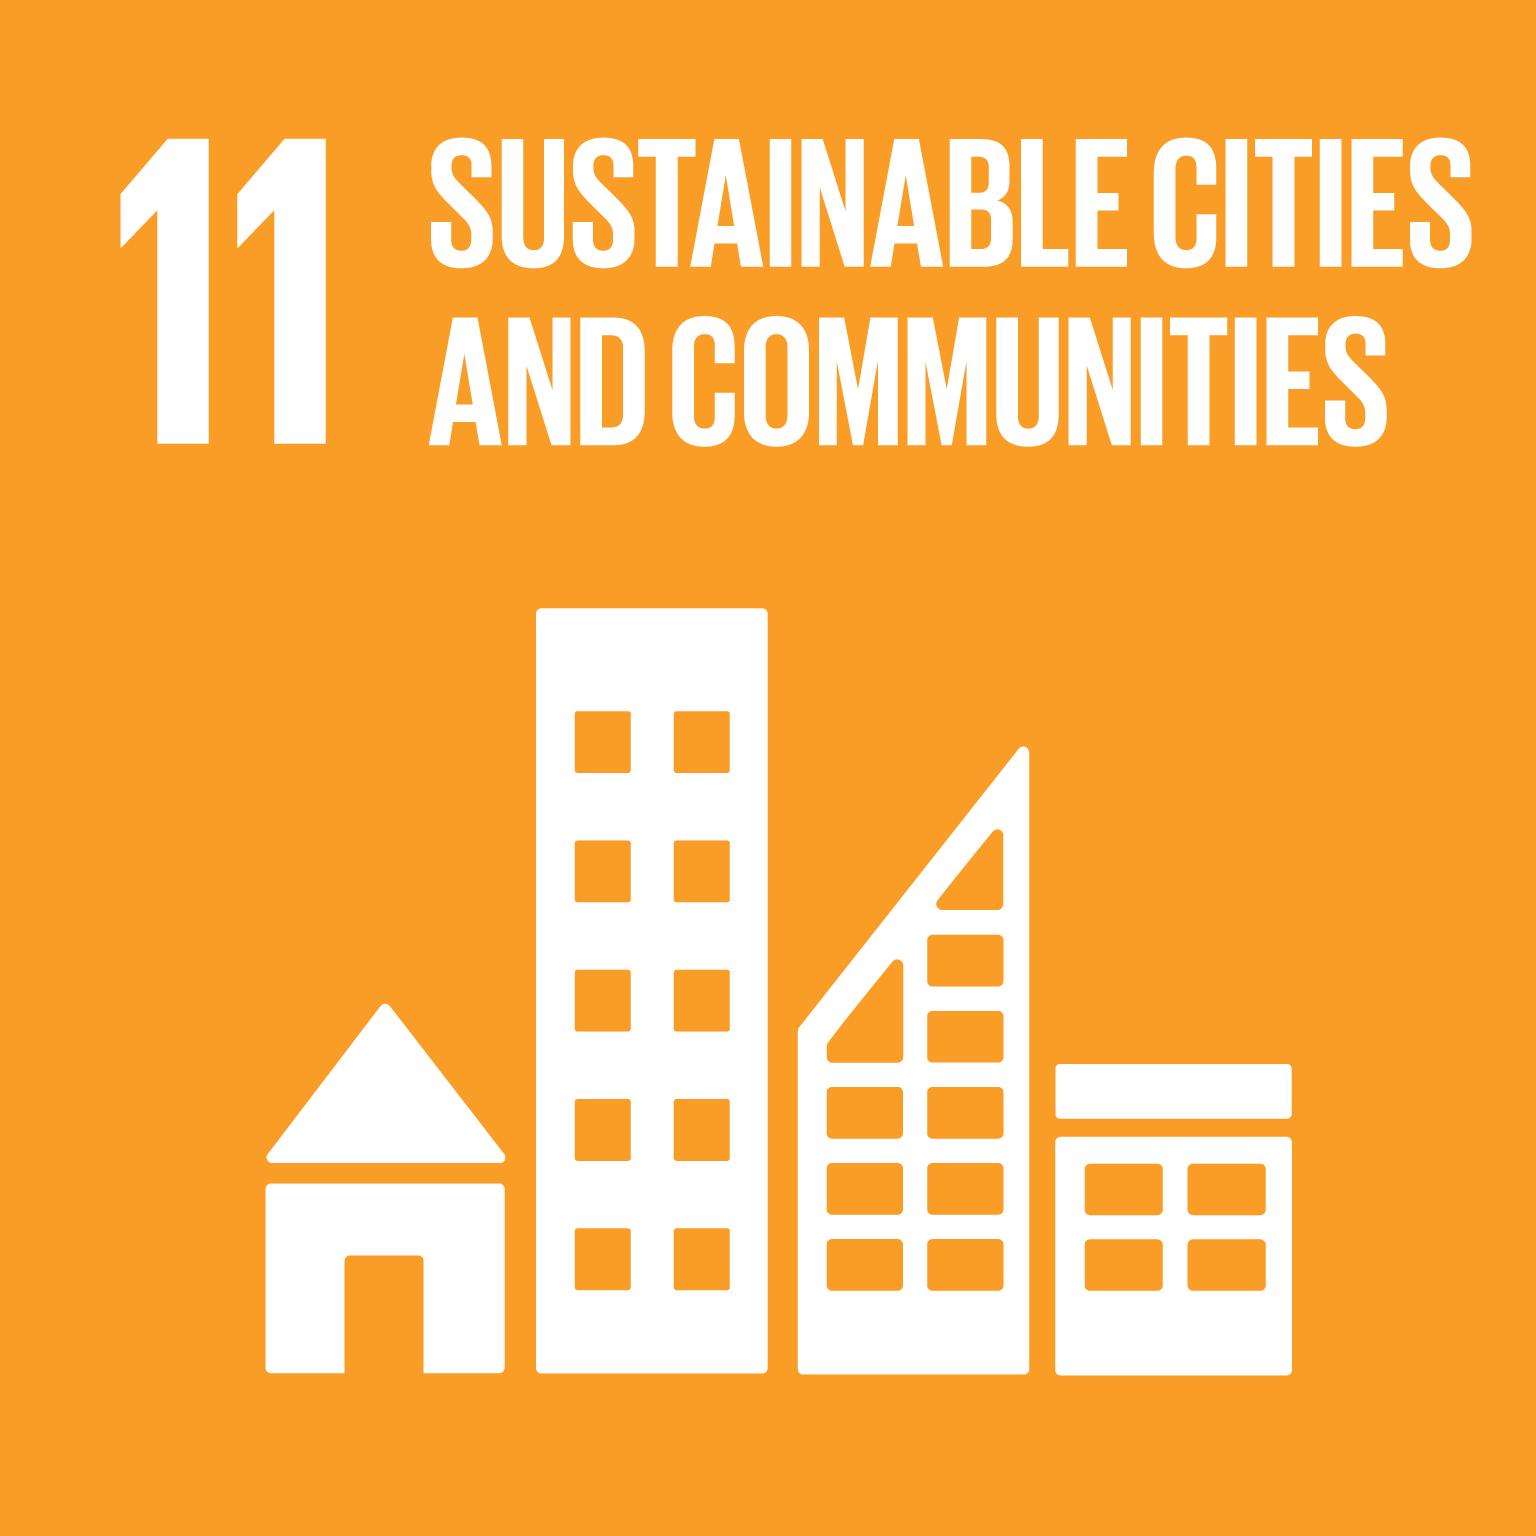 11 sustainabile cities & communities.png